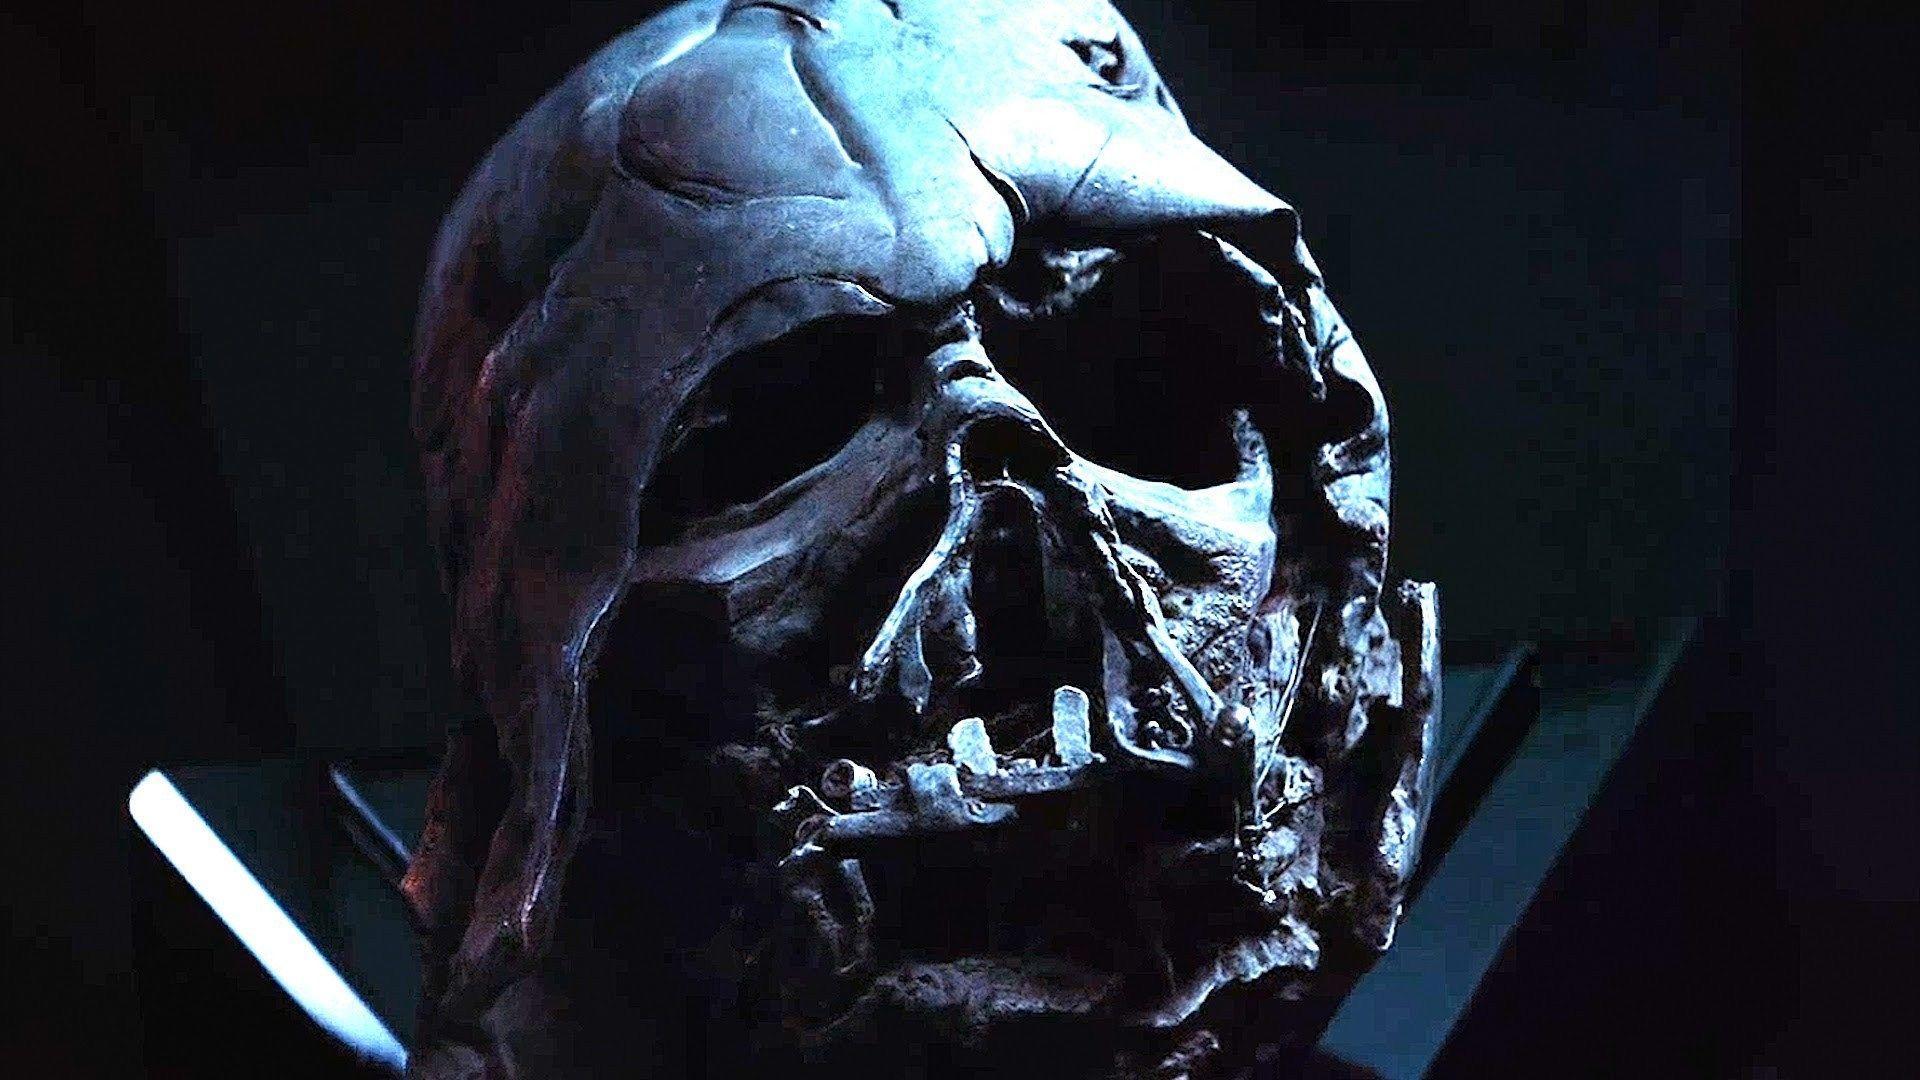 Broken Mask Darth Vader Wallpaper Backgrounds Capacete Do Darth Vader Exercicios De Desenho Coisa De Nerd